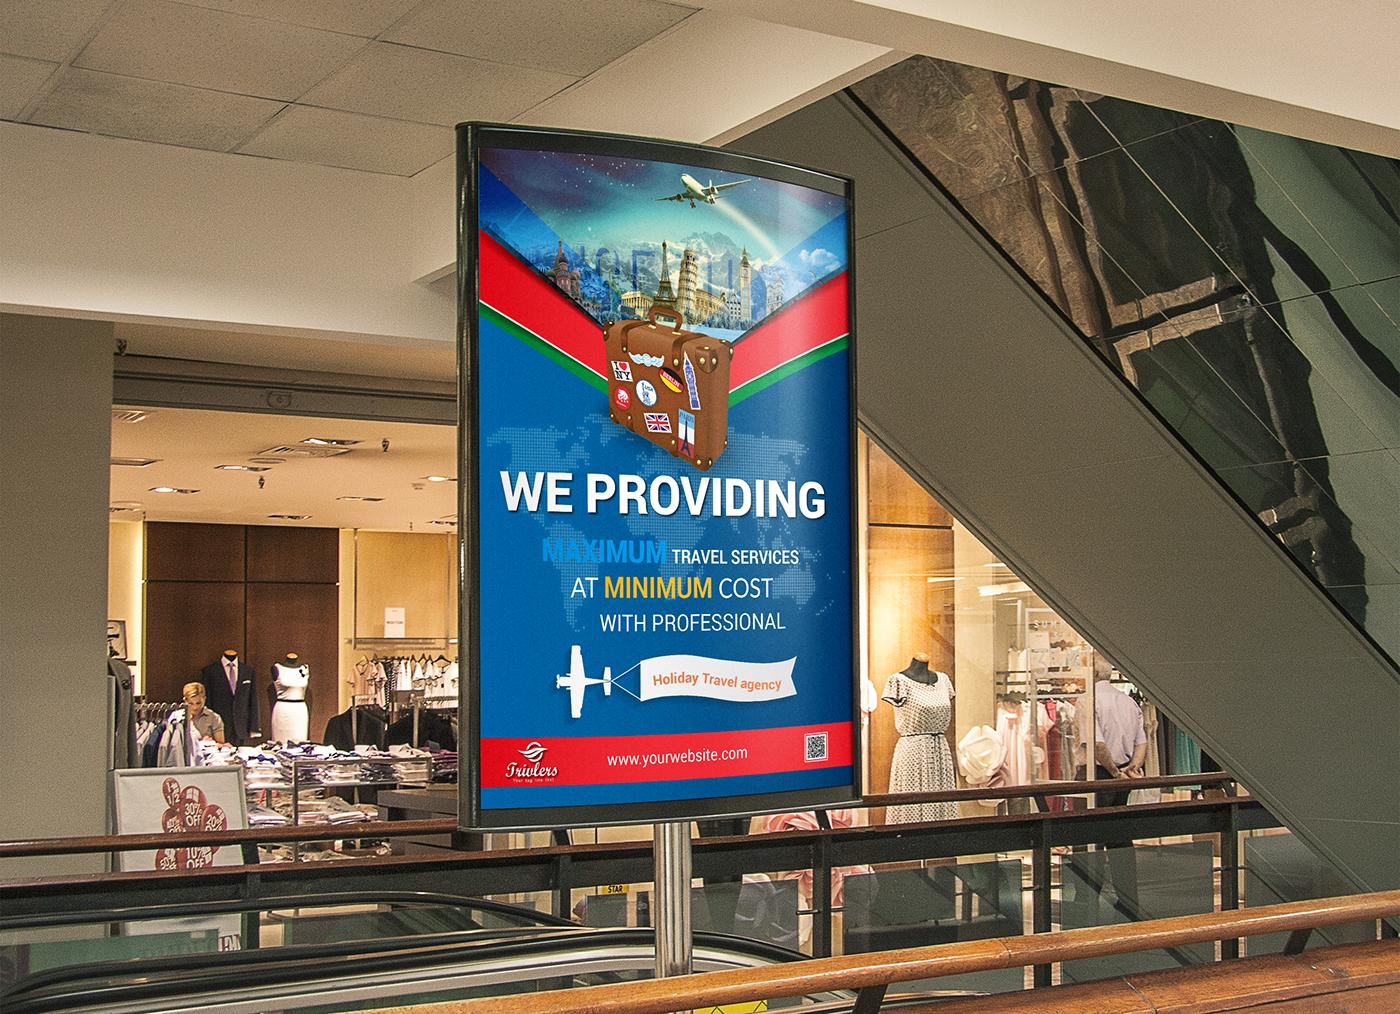 travel agency billboard